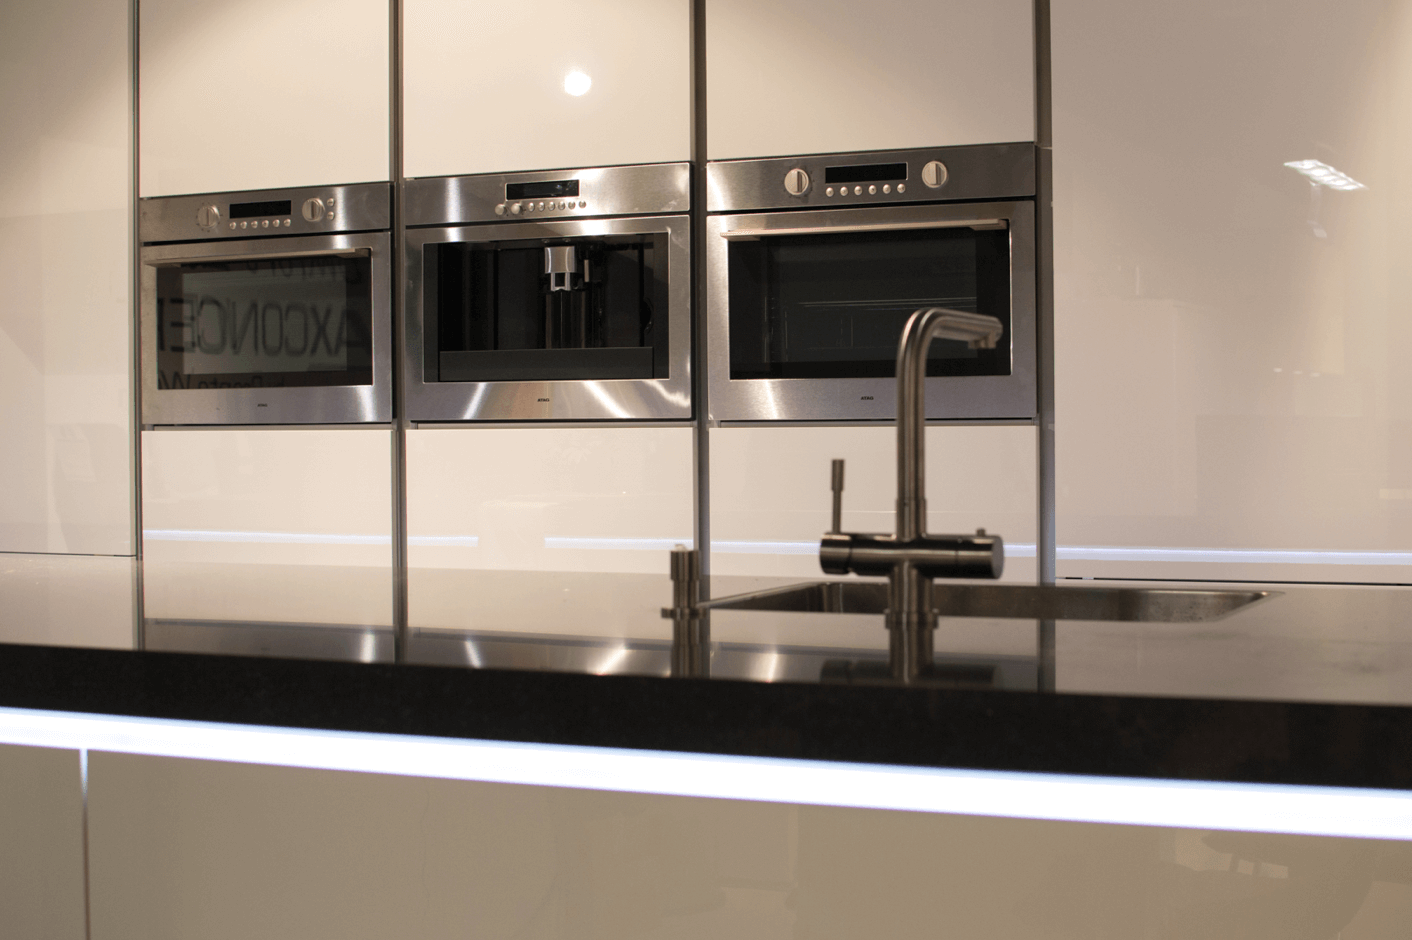 Keuken Apparatuur Merken : Keukenspecialist den bosch in den bosch uw keuken